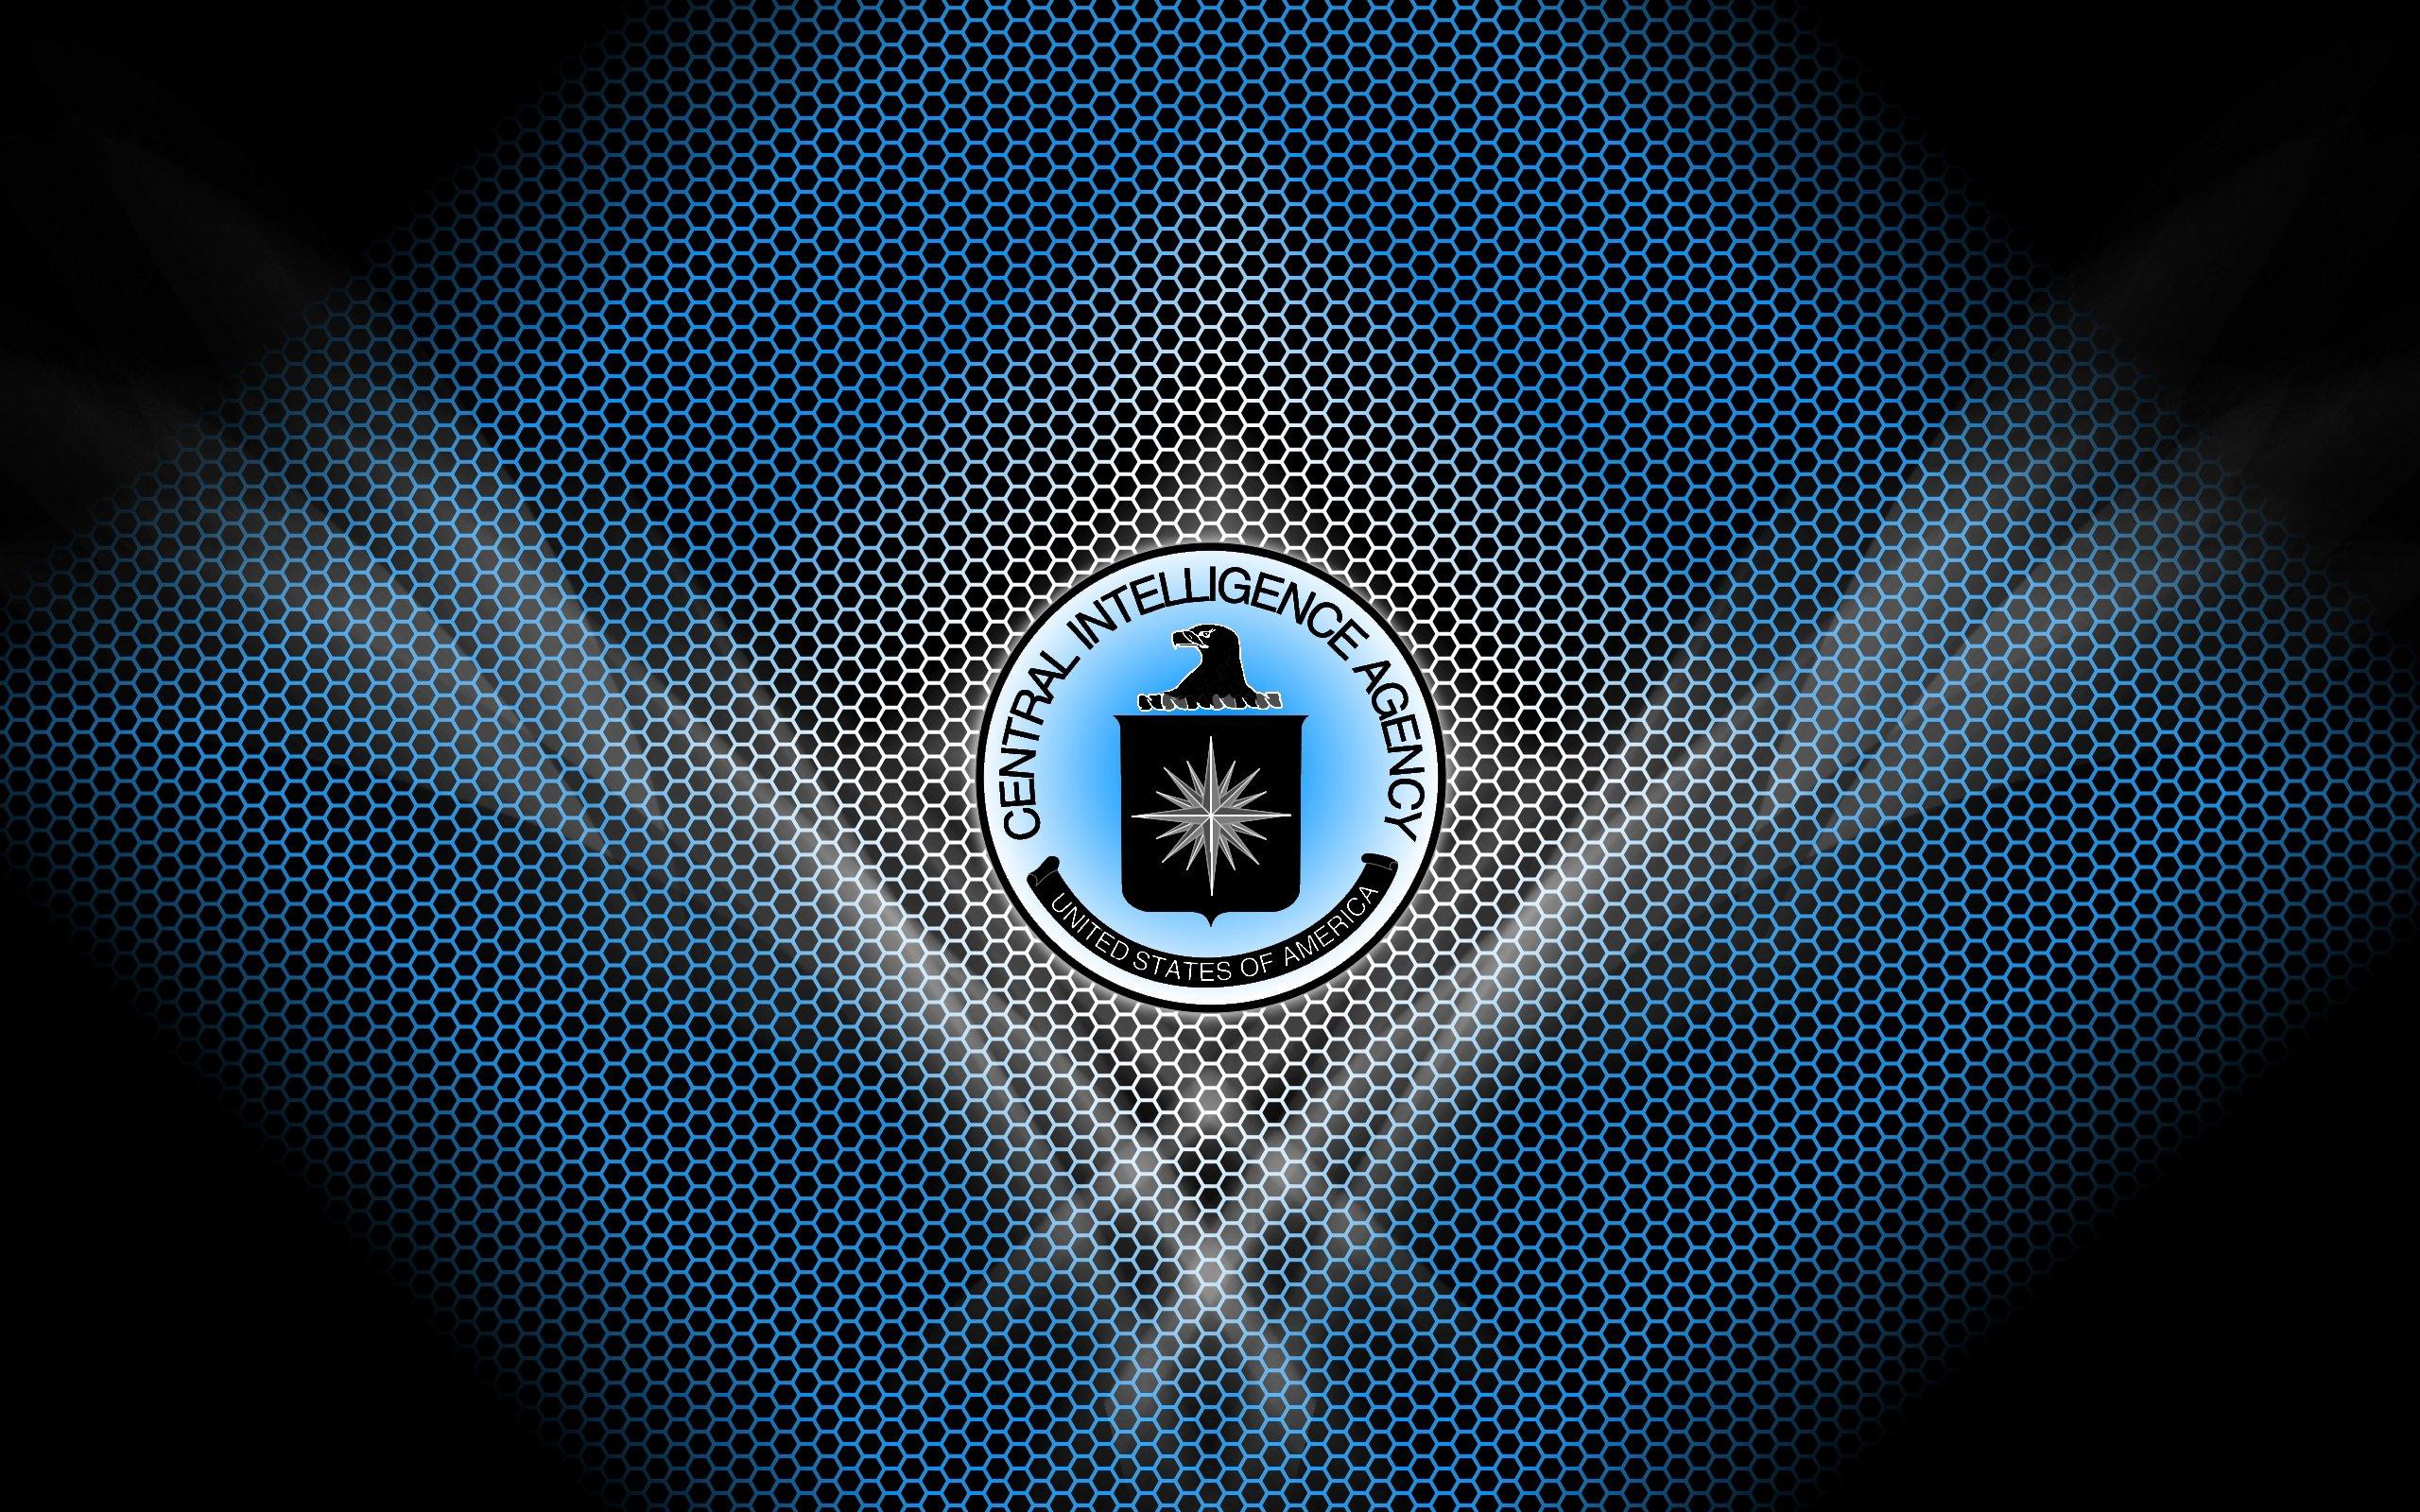 CIA Central Intelligence Agency crime usa america spy logo wallpaper 2560x1600